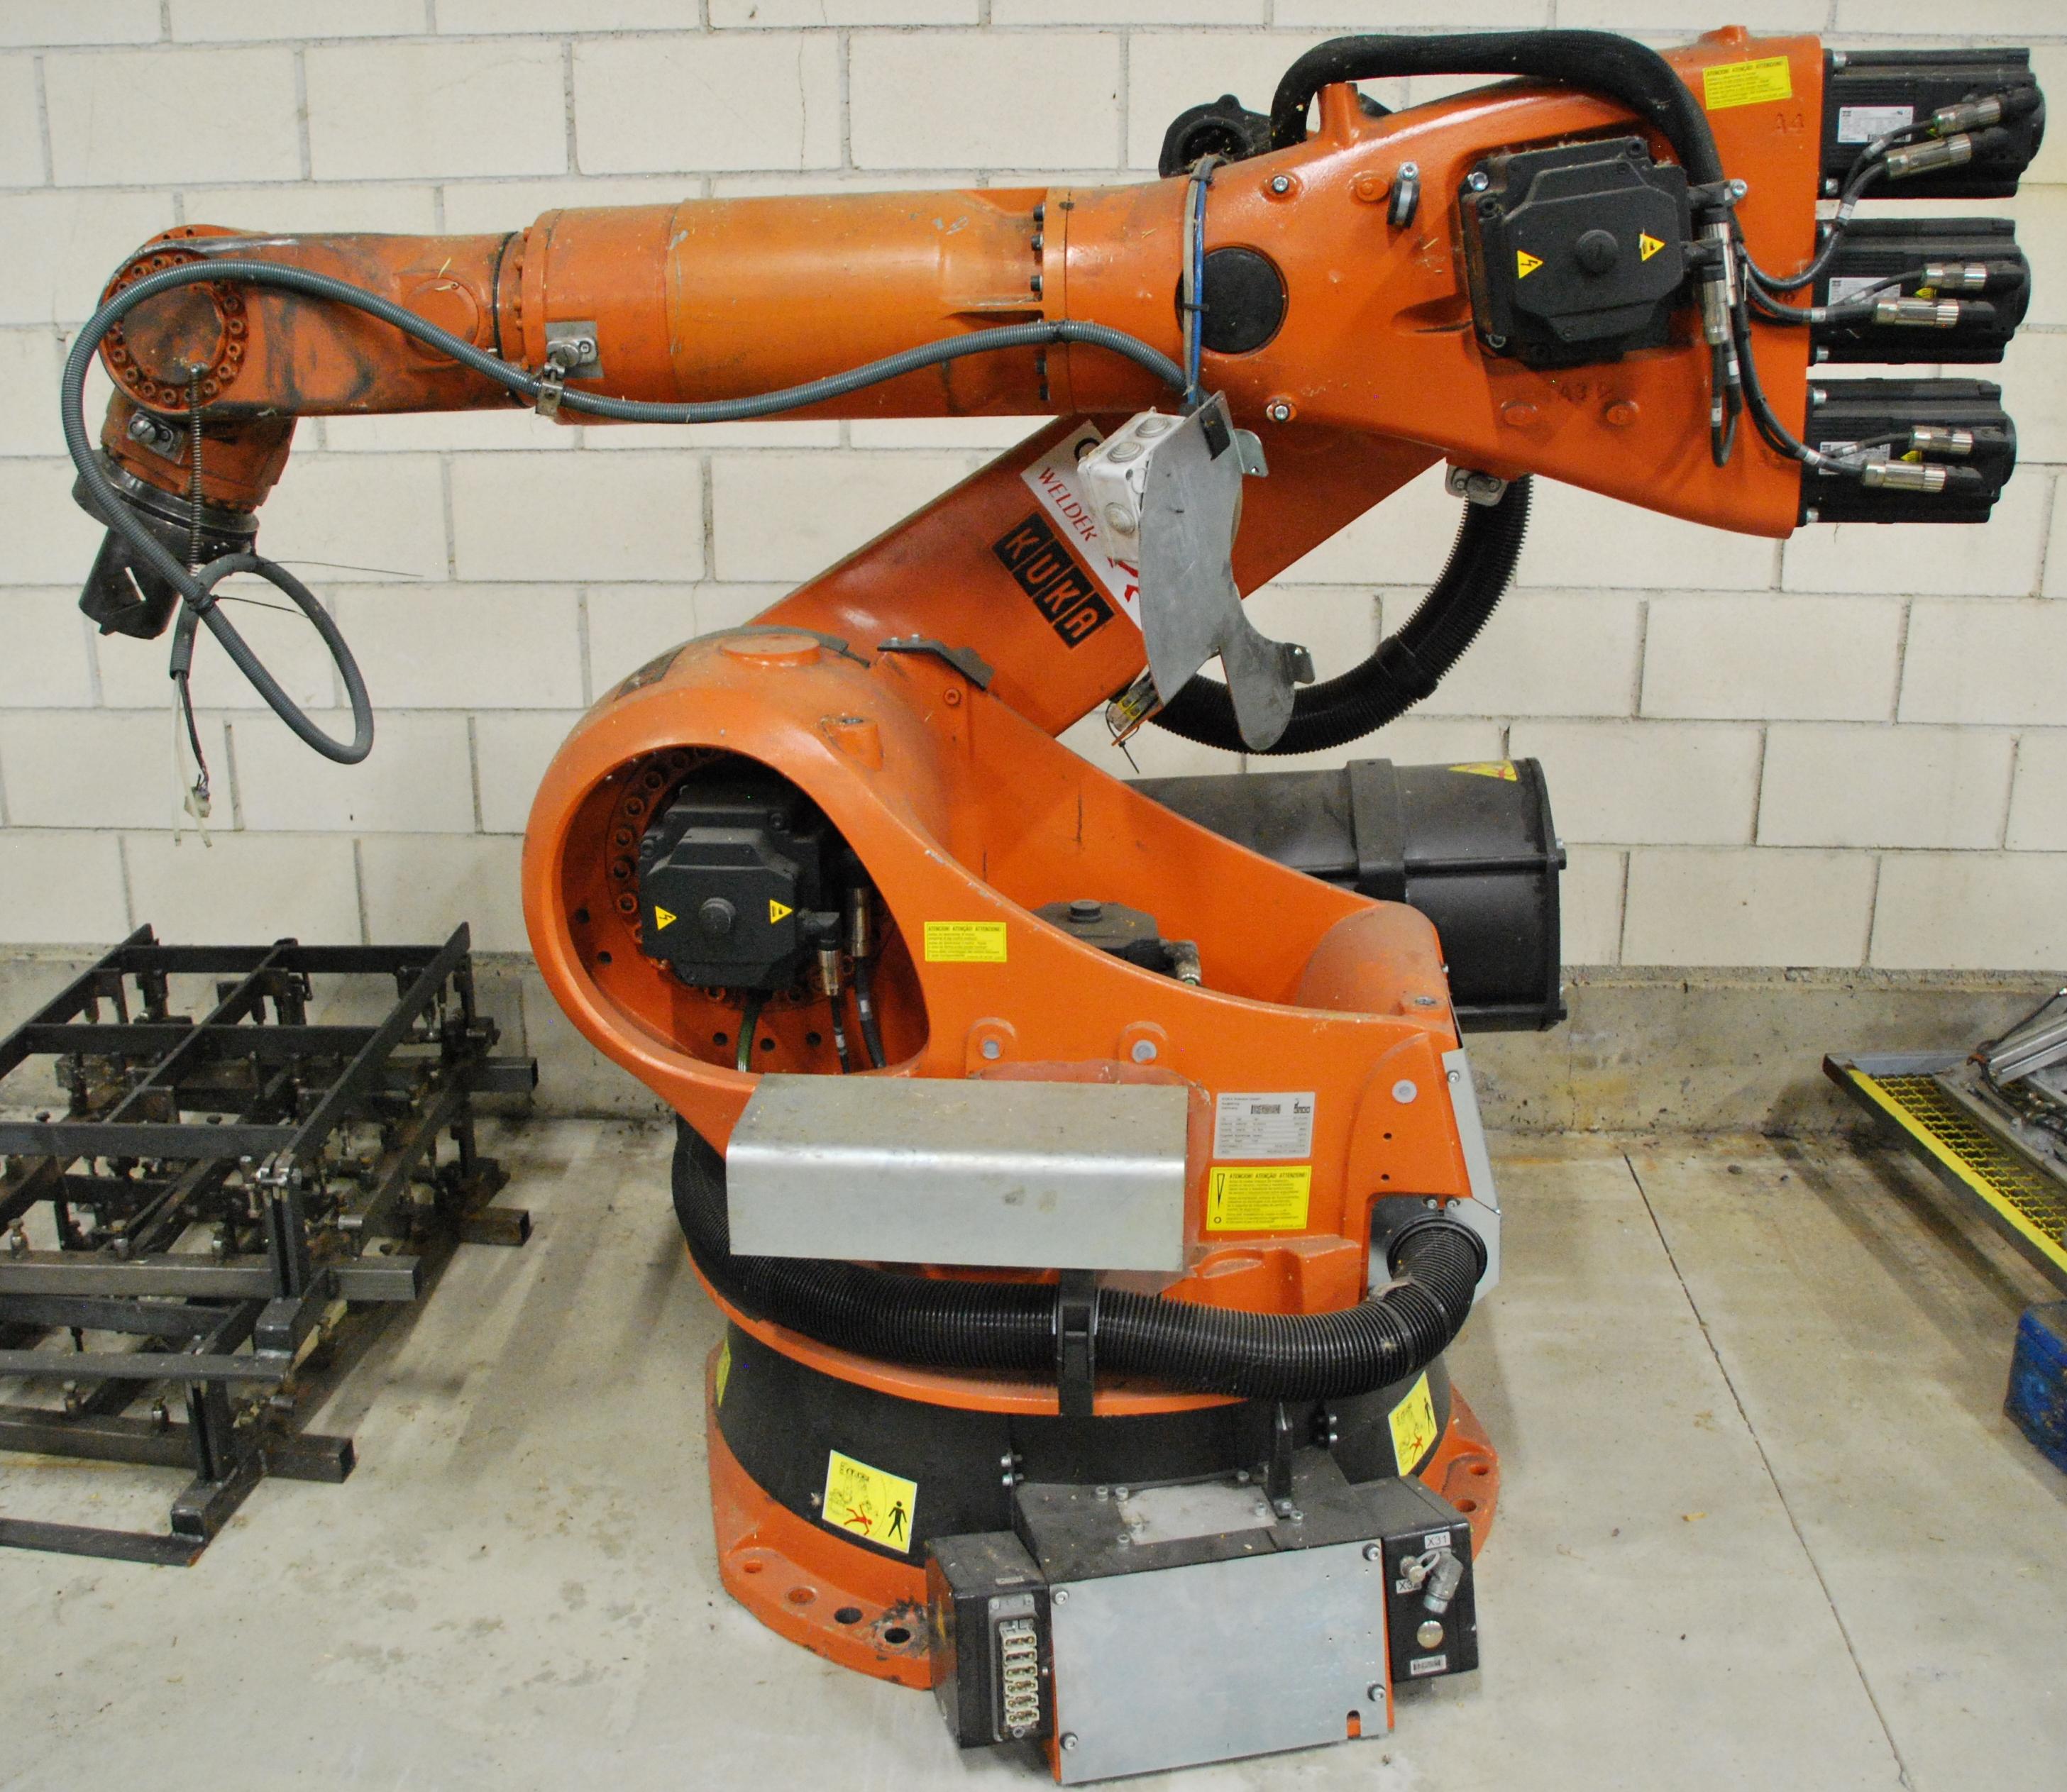 Robot industrial kuka kr 140 de segunda mano maquinas de for Robot limpiafondos piscina segunda mano